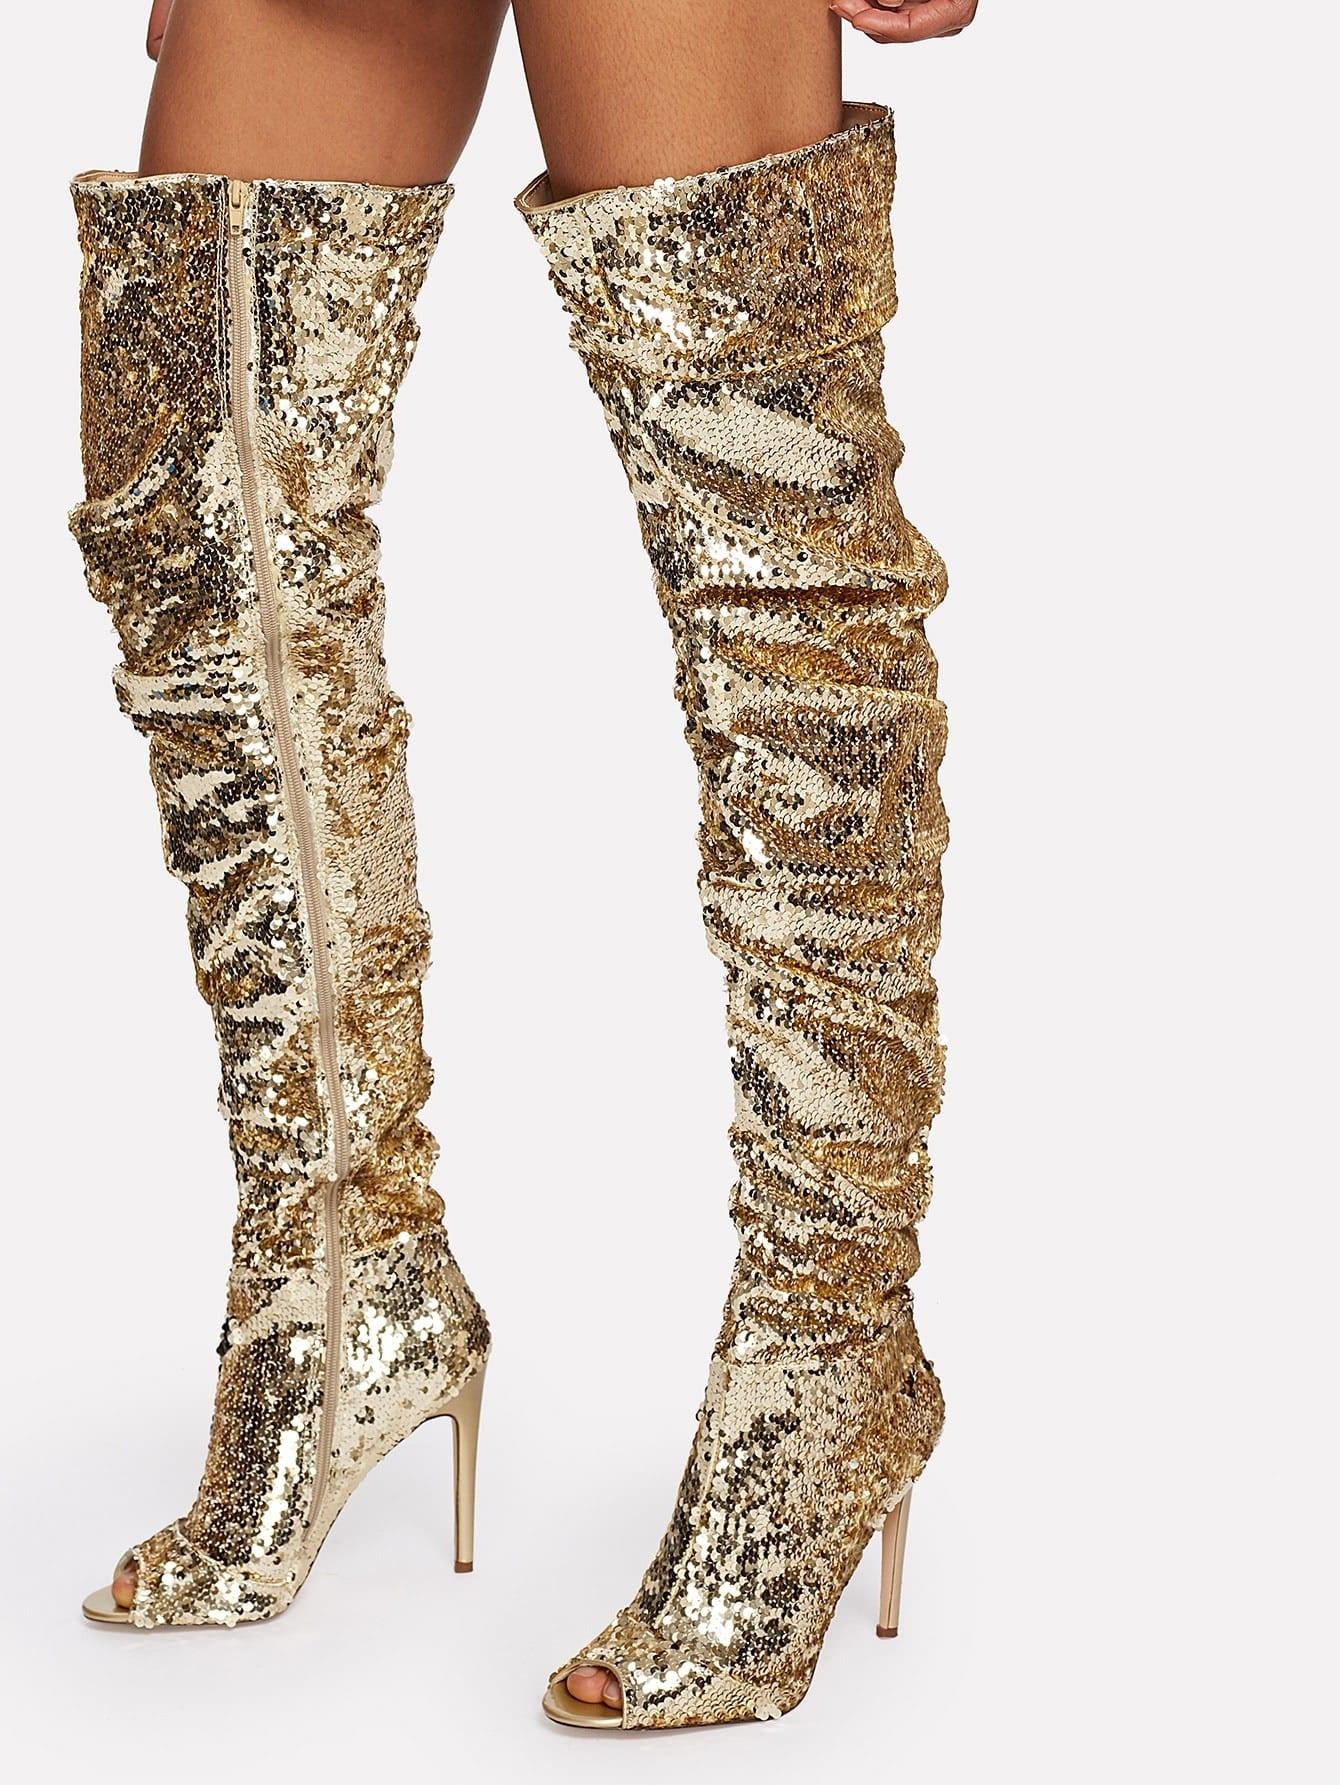 Sequin Overlay Block Heeled Thigh High Boots